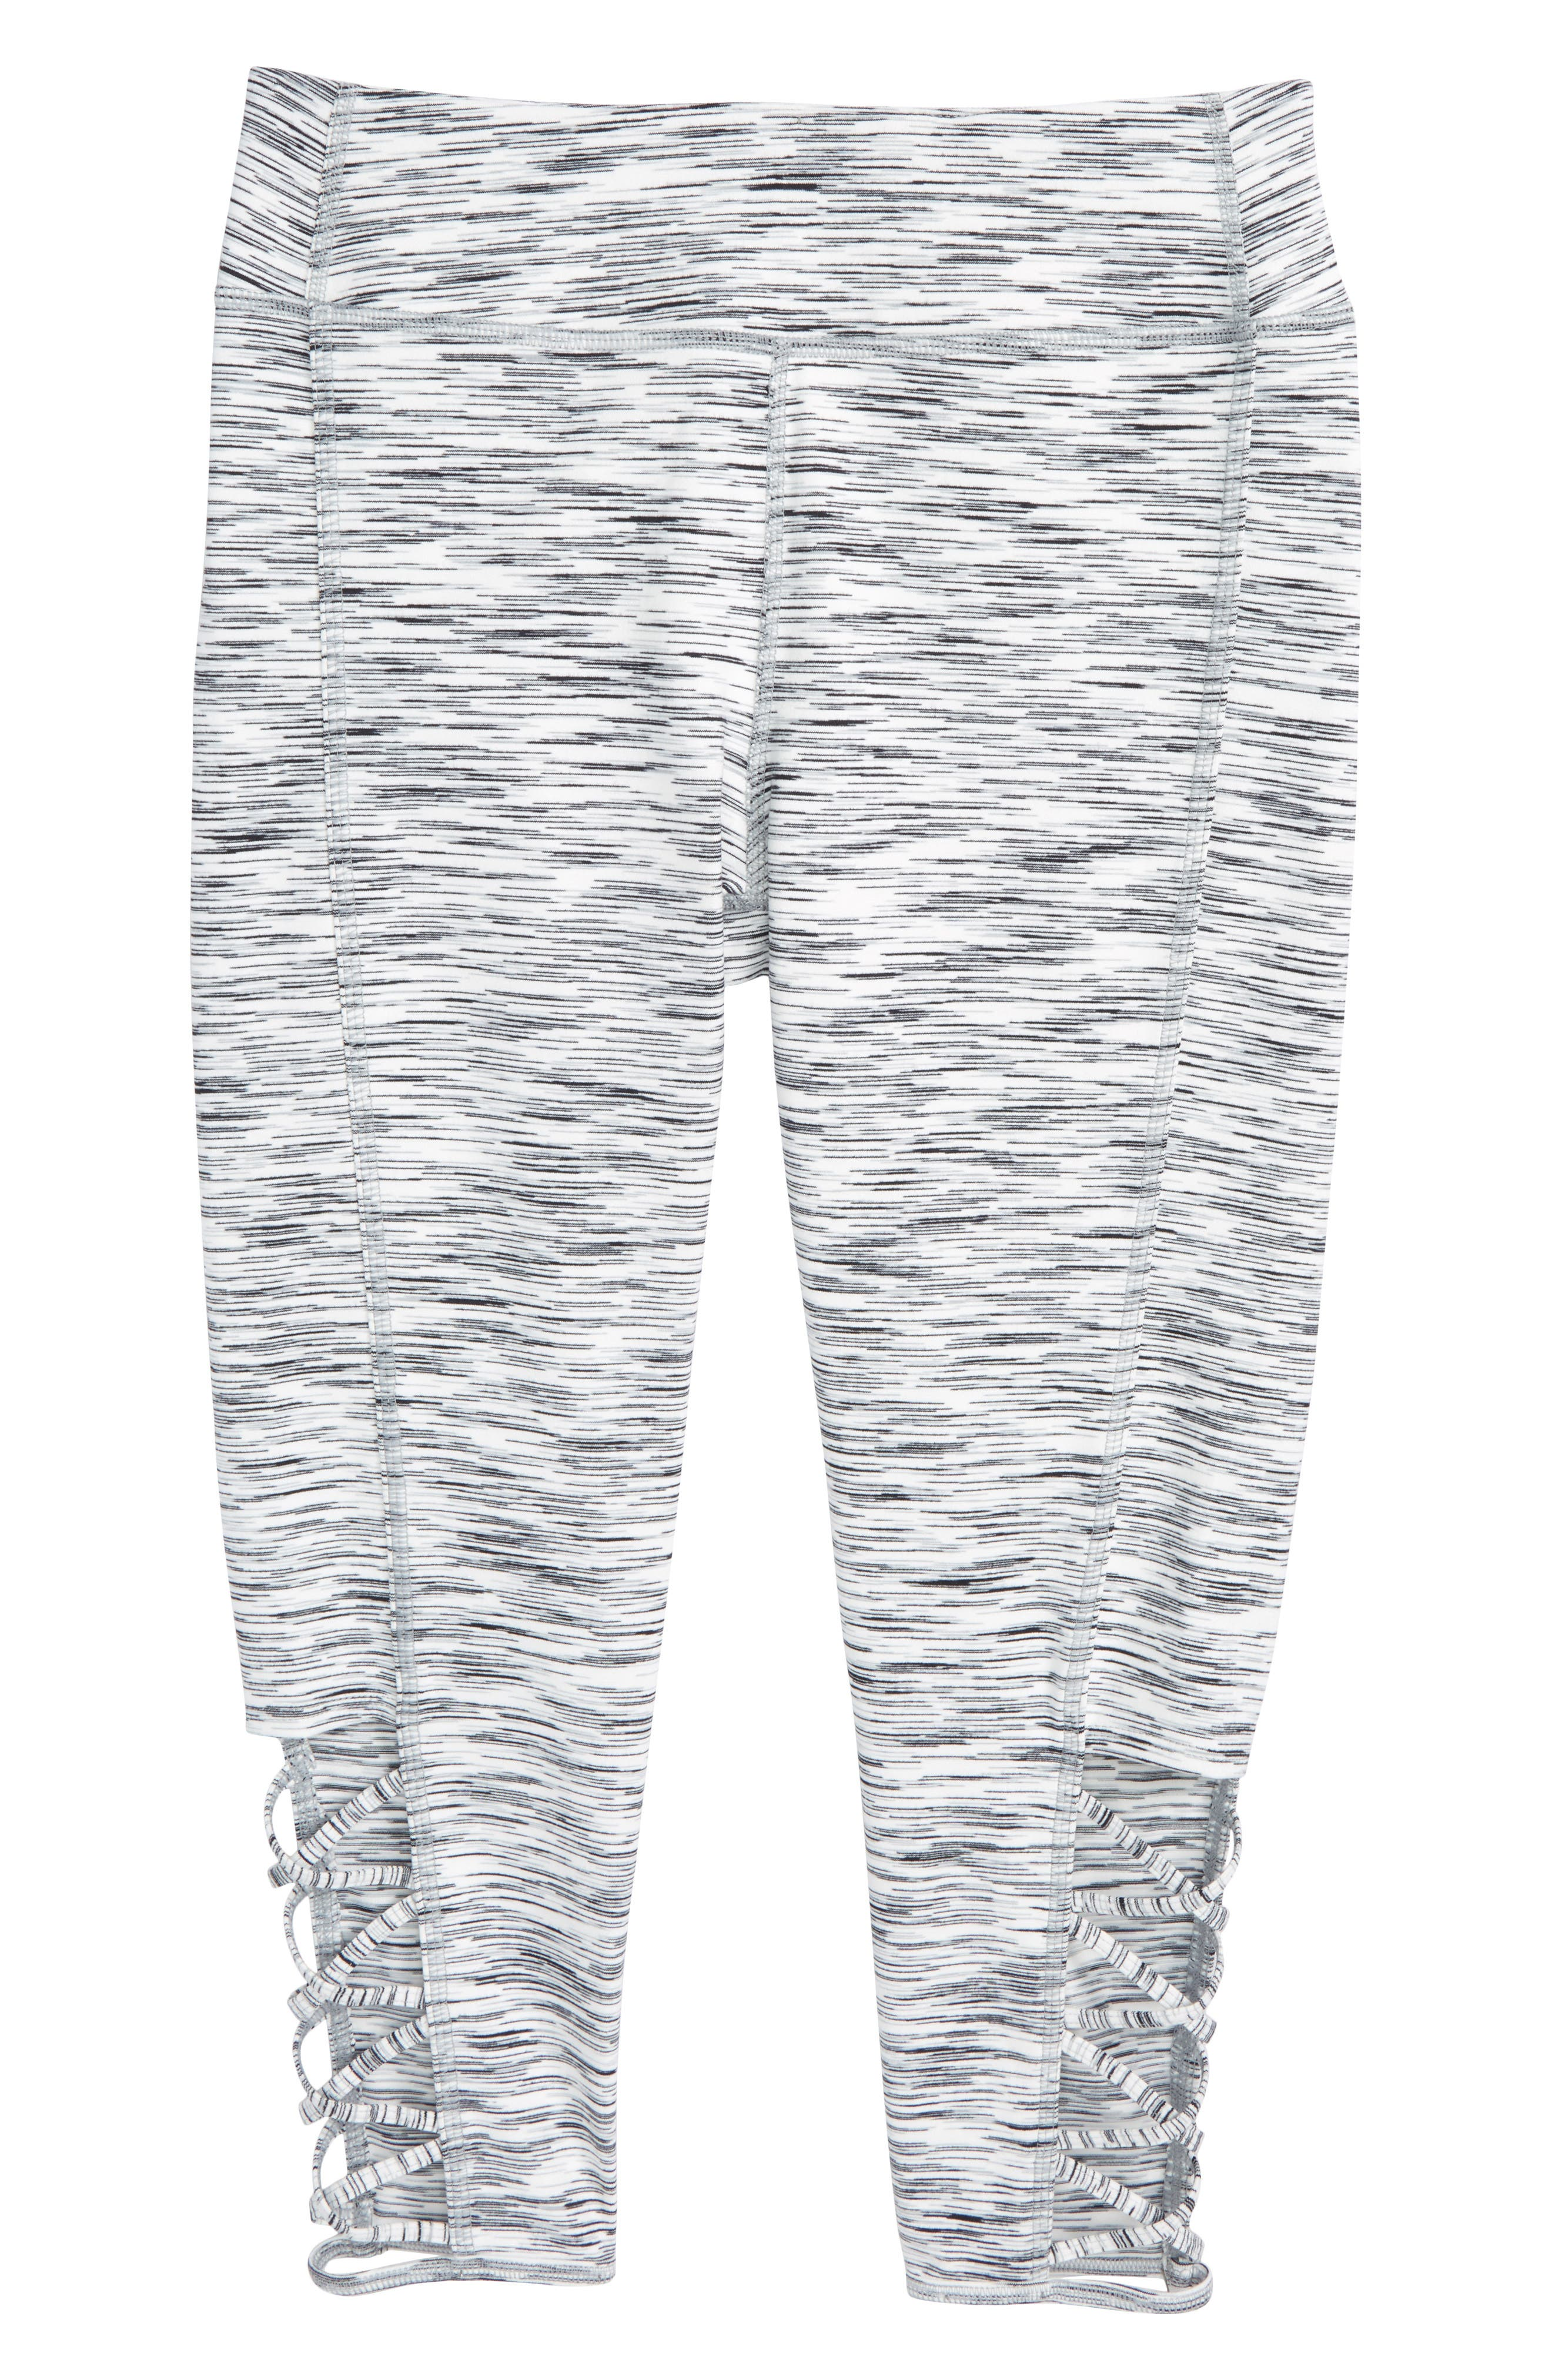 ZELLA GIRL High Waist Lattice Crop Leggings, Main, color, WHITE ECLIPSE SPACEDYE